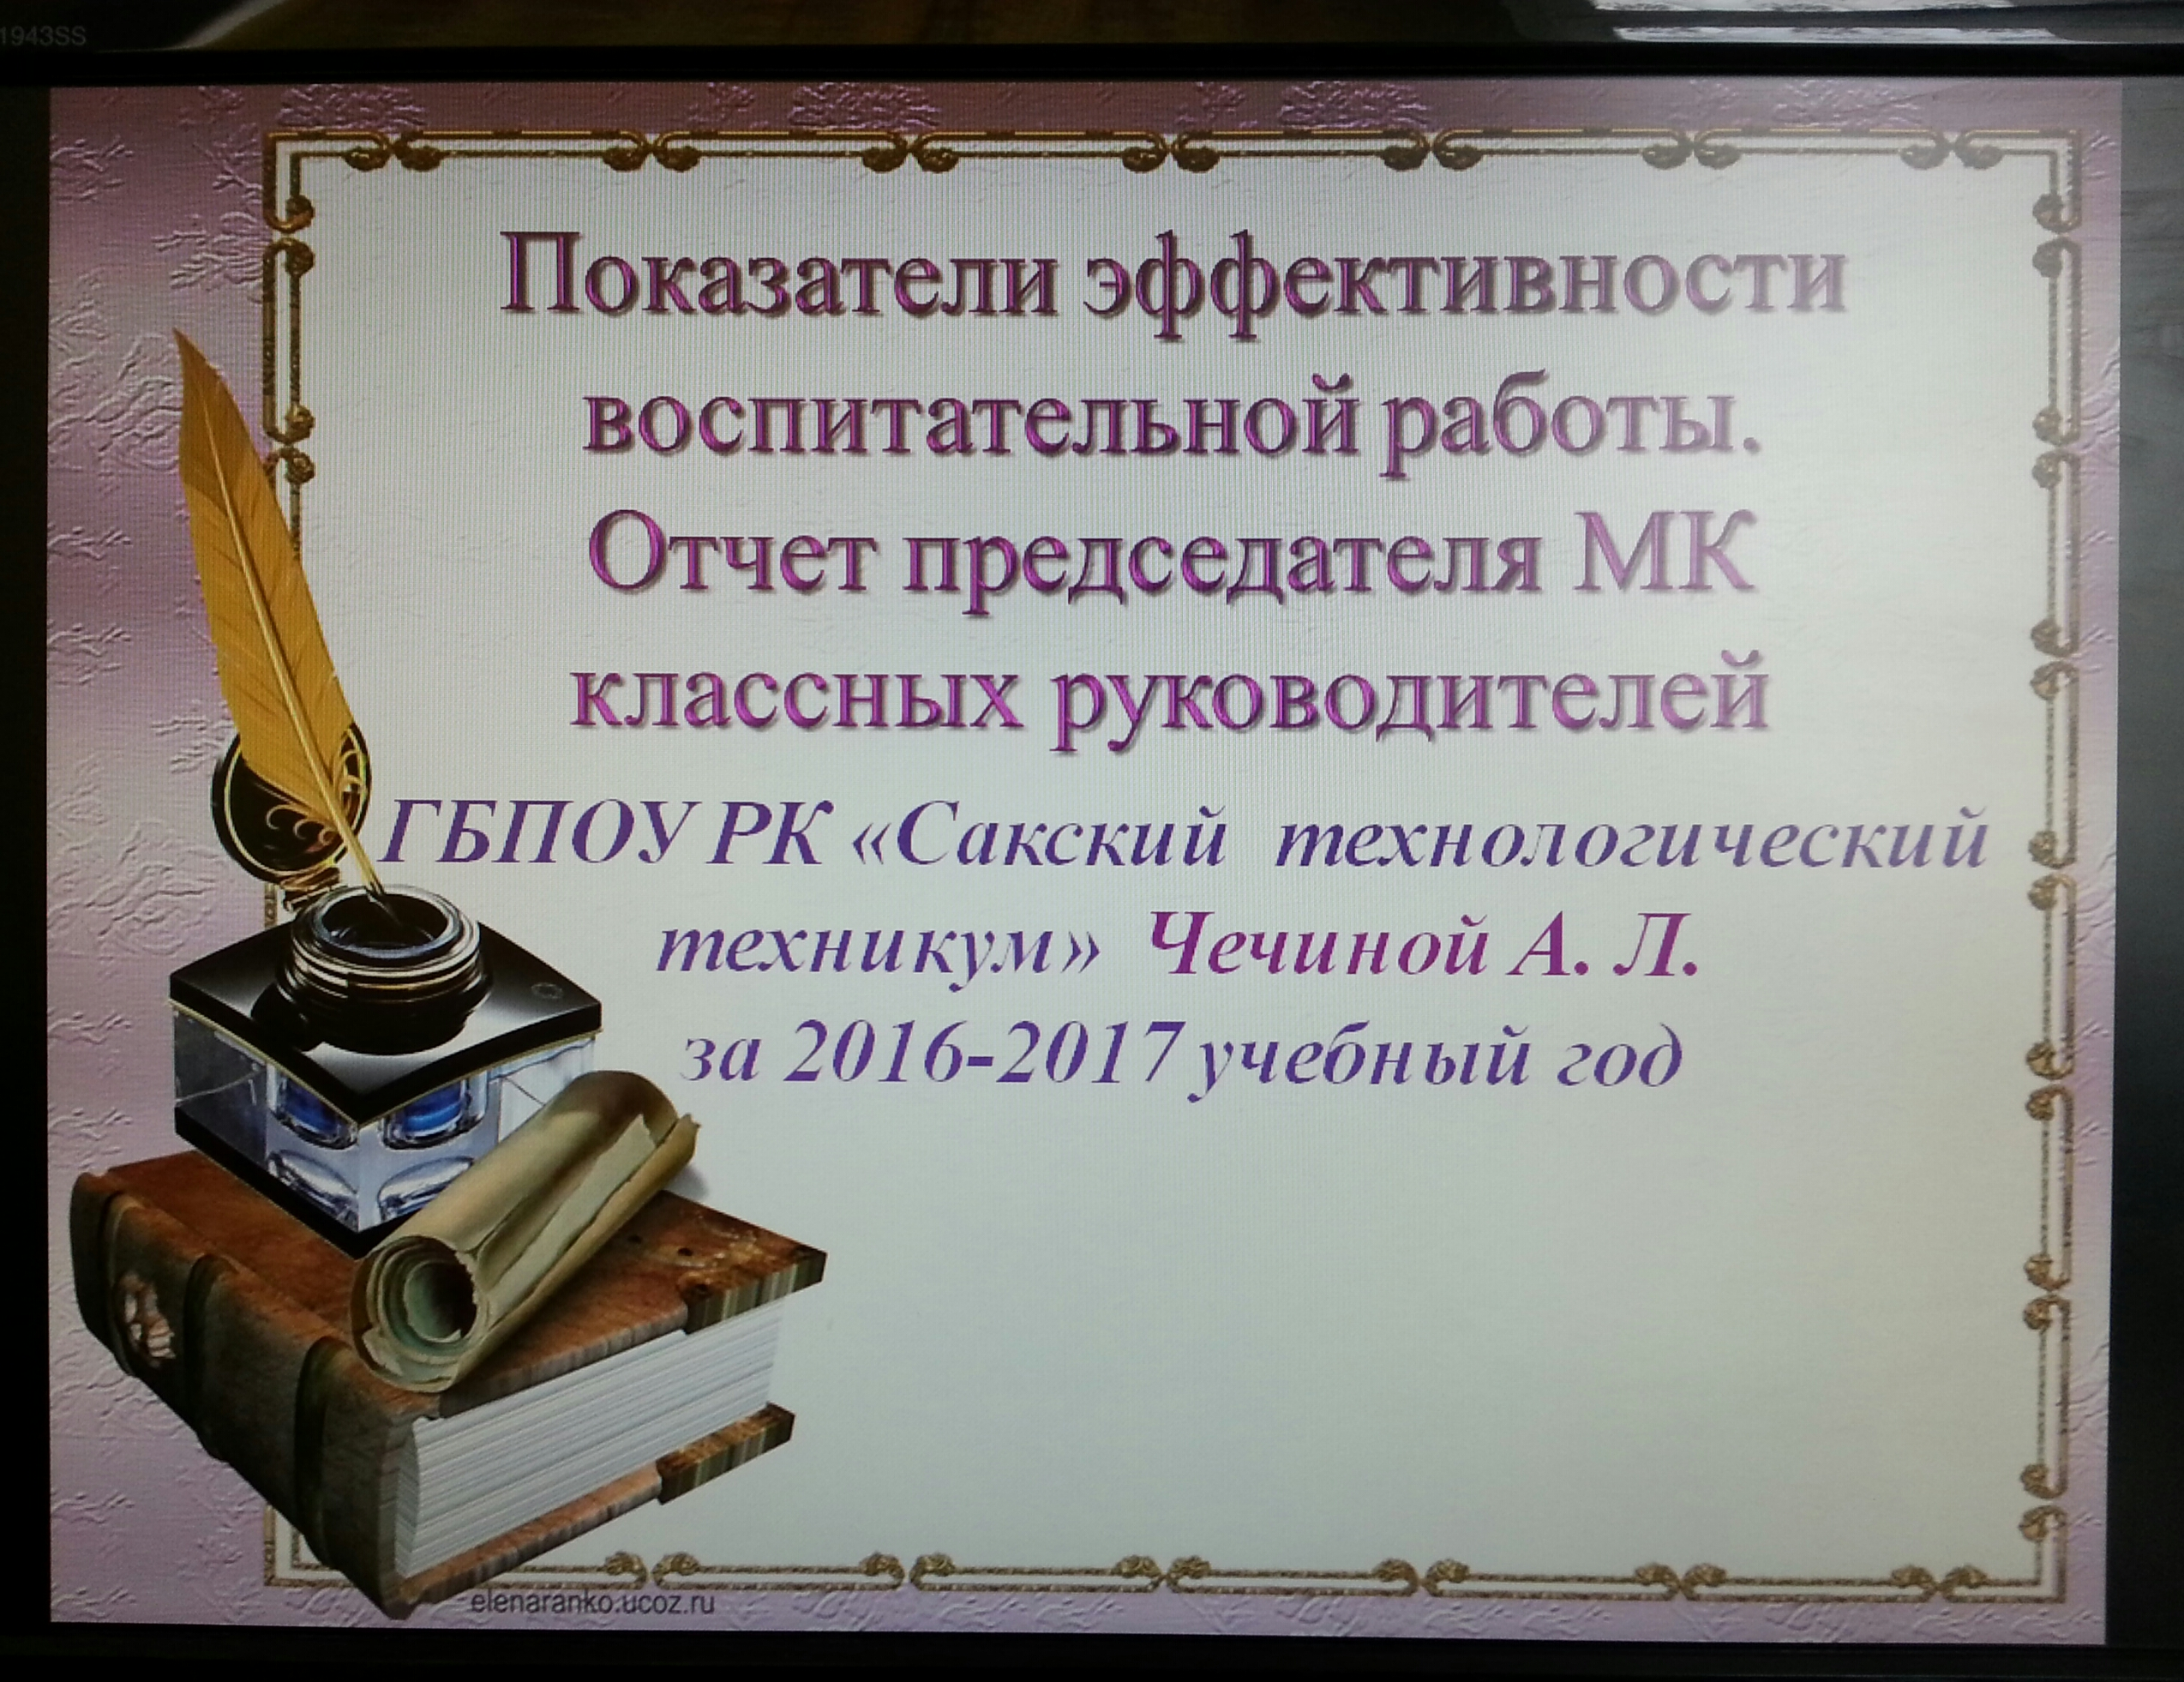 20170622_082659-1